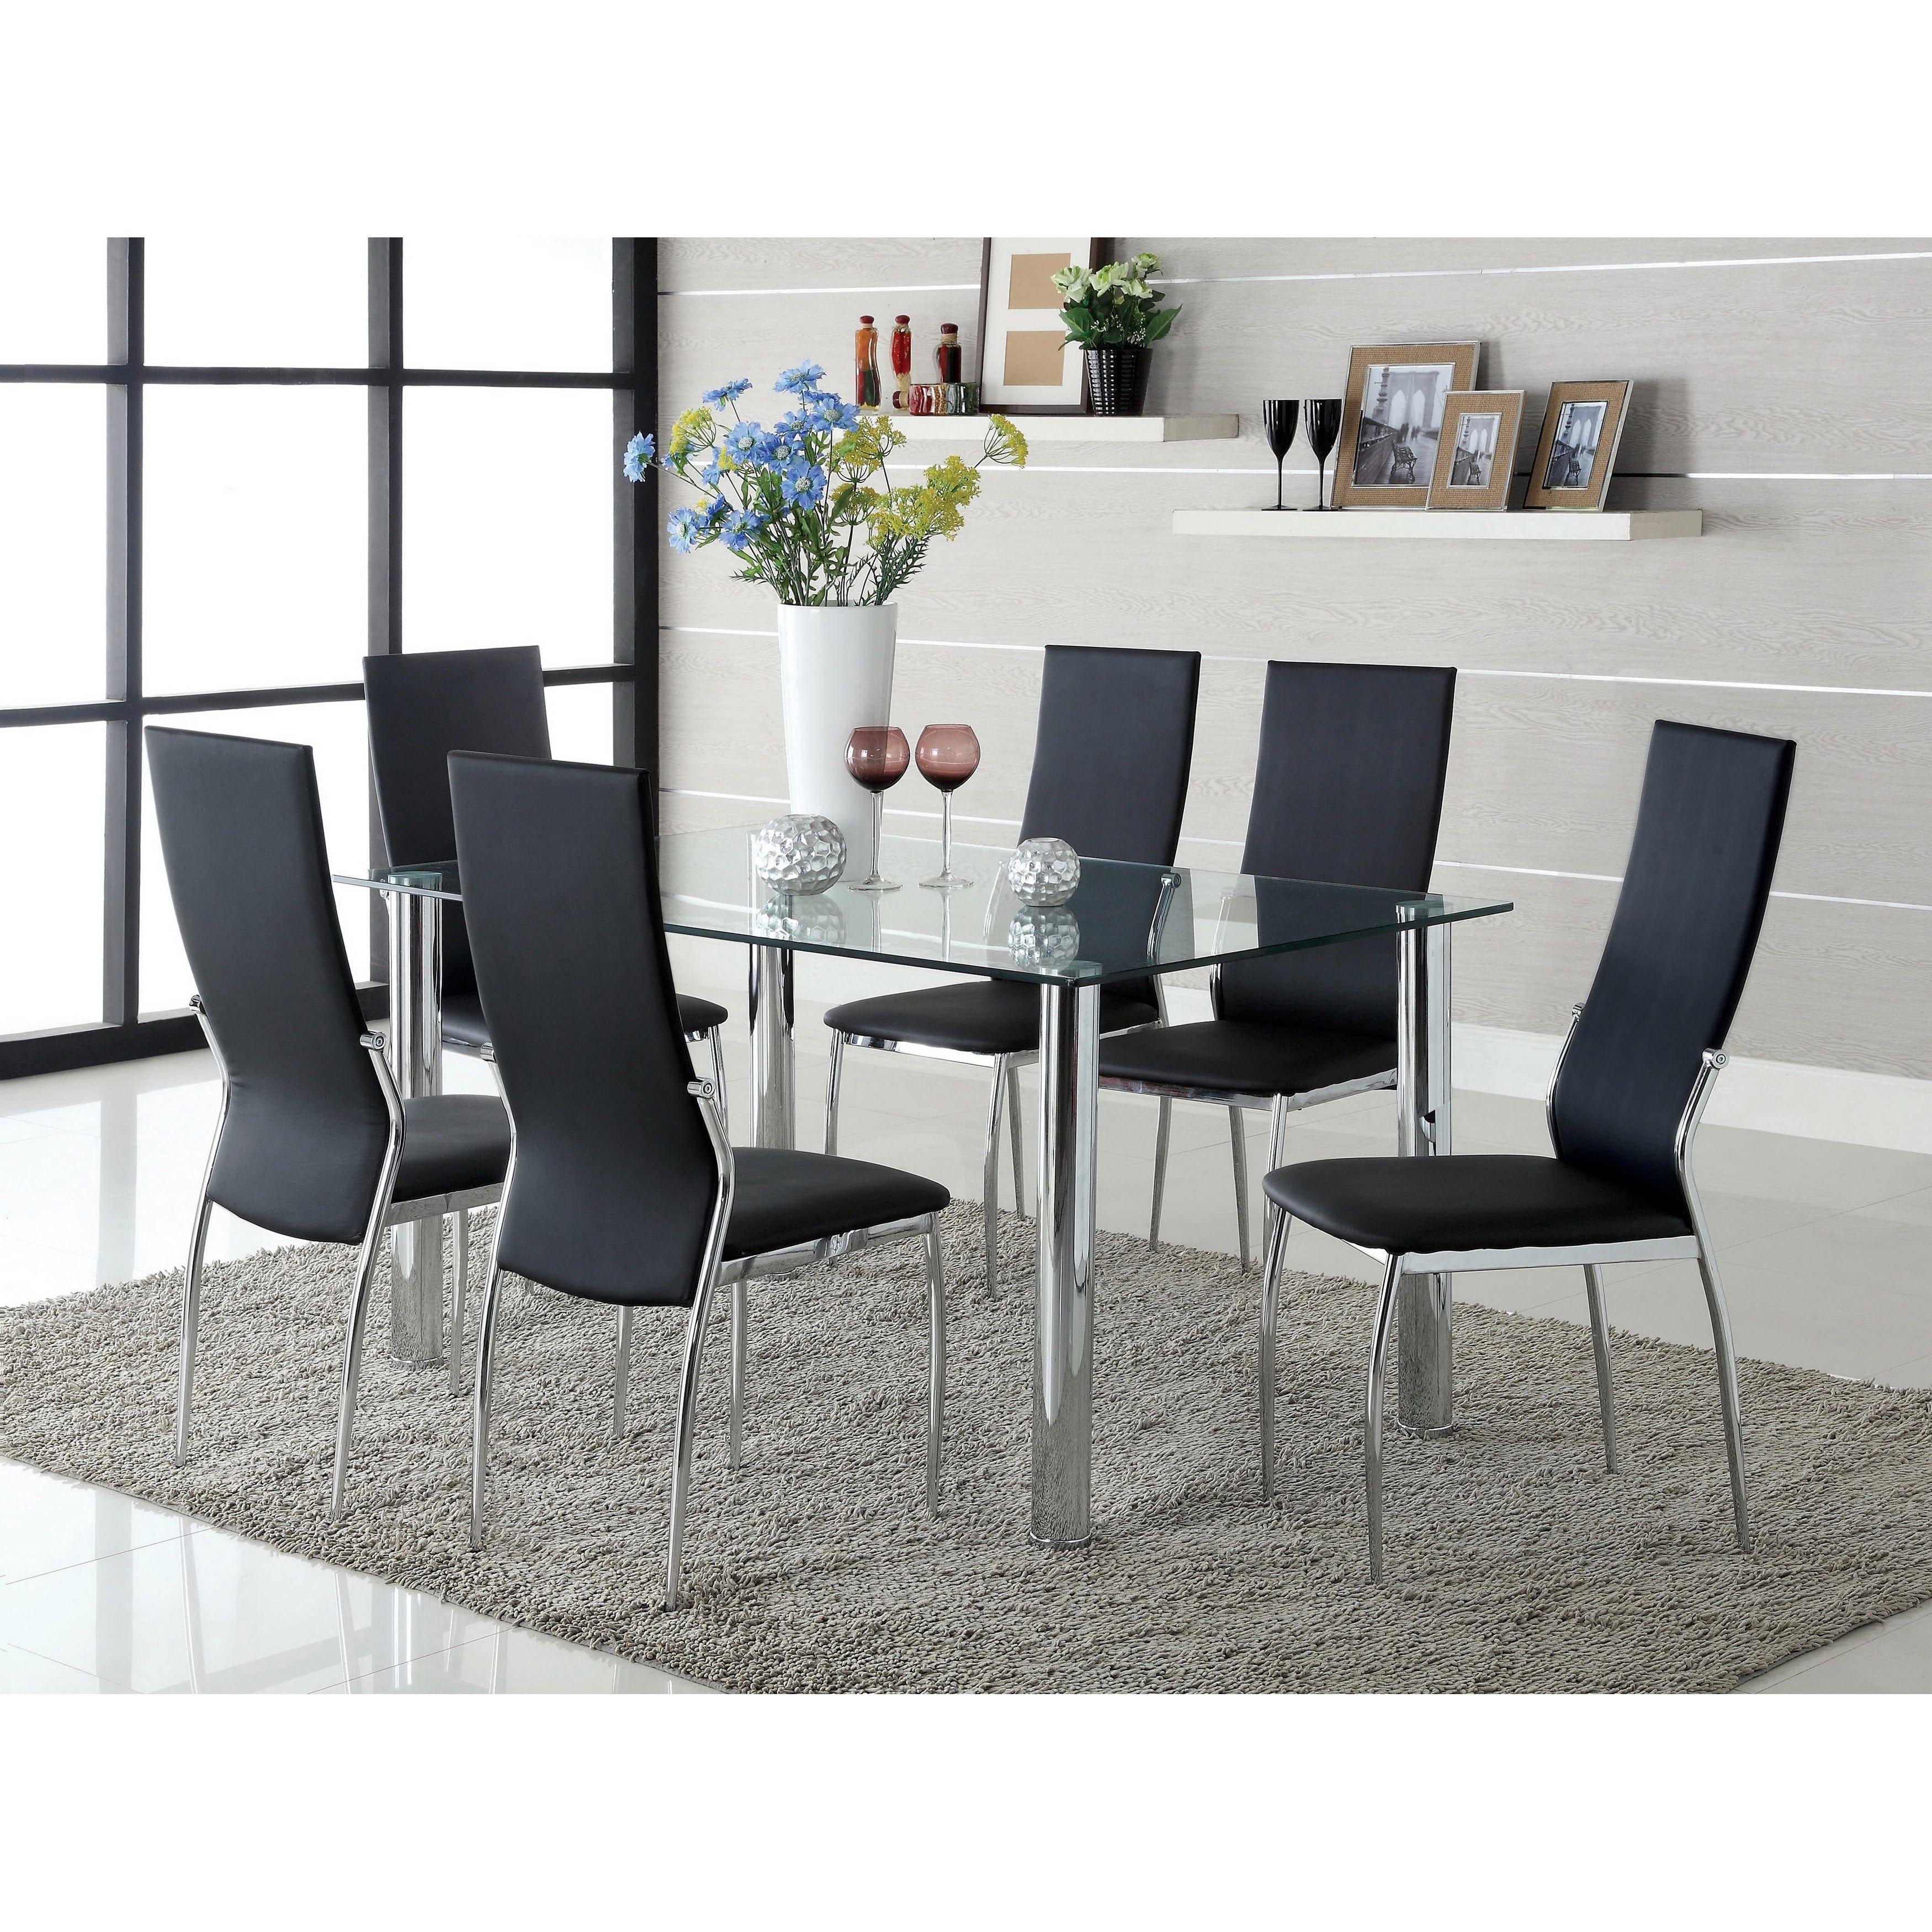 Furniture of America Duarte Modern Leatherette Dining